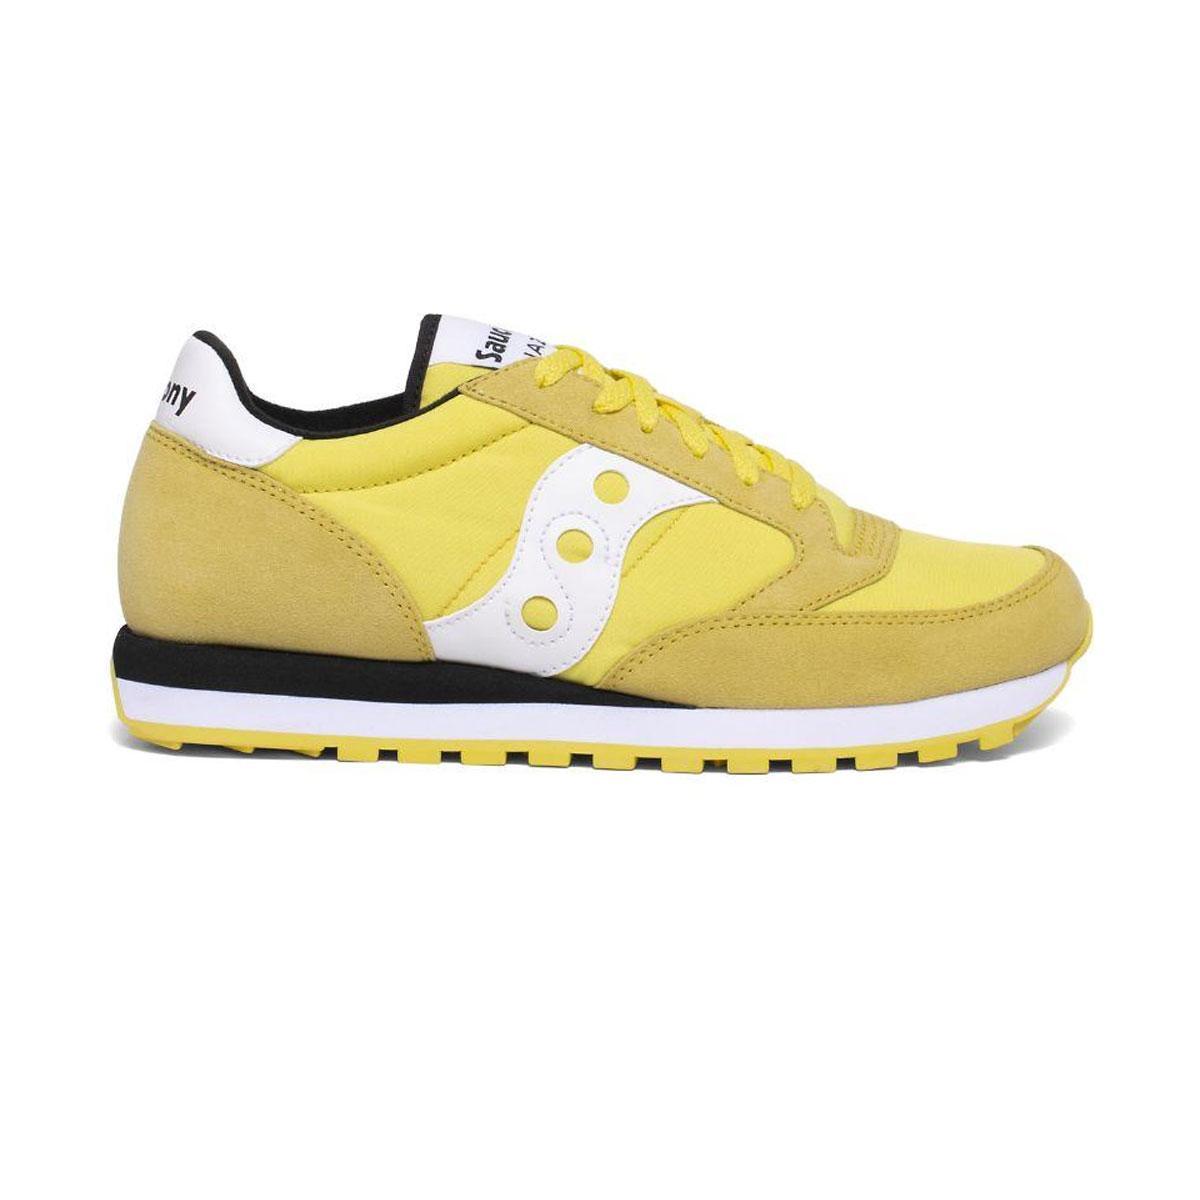 Scarpe Sneakers Saucony Jazz Original da uomo rif. S2044-559